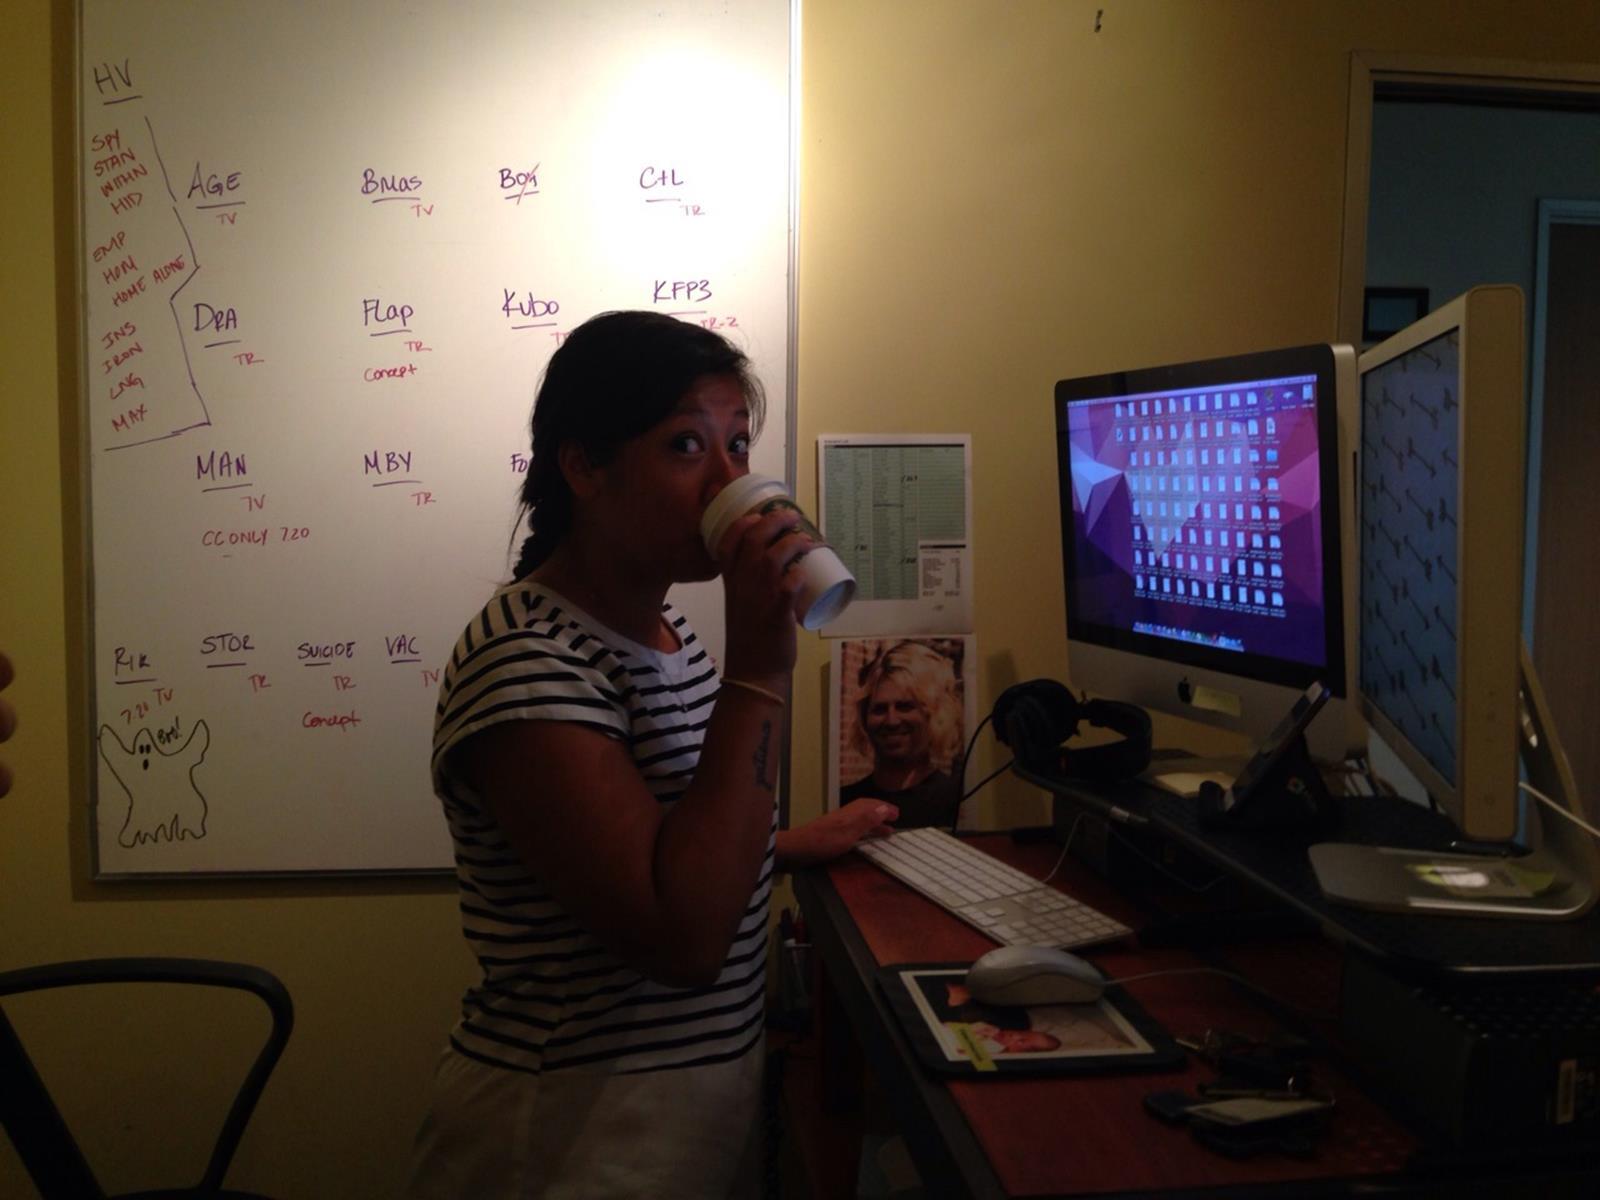 Lana in ihrem Büro